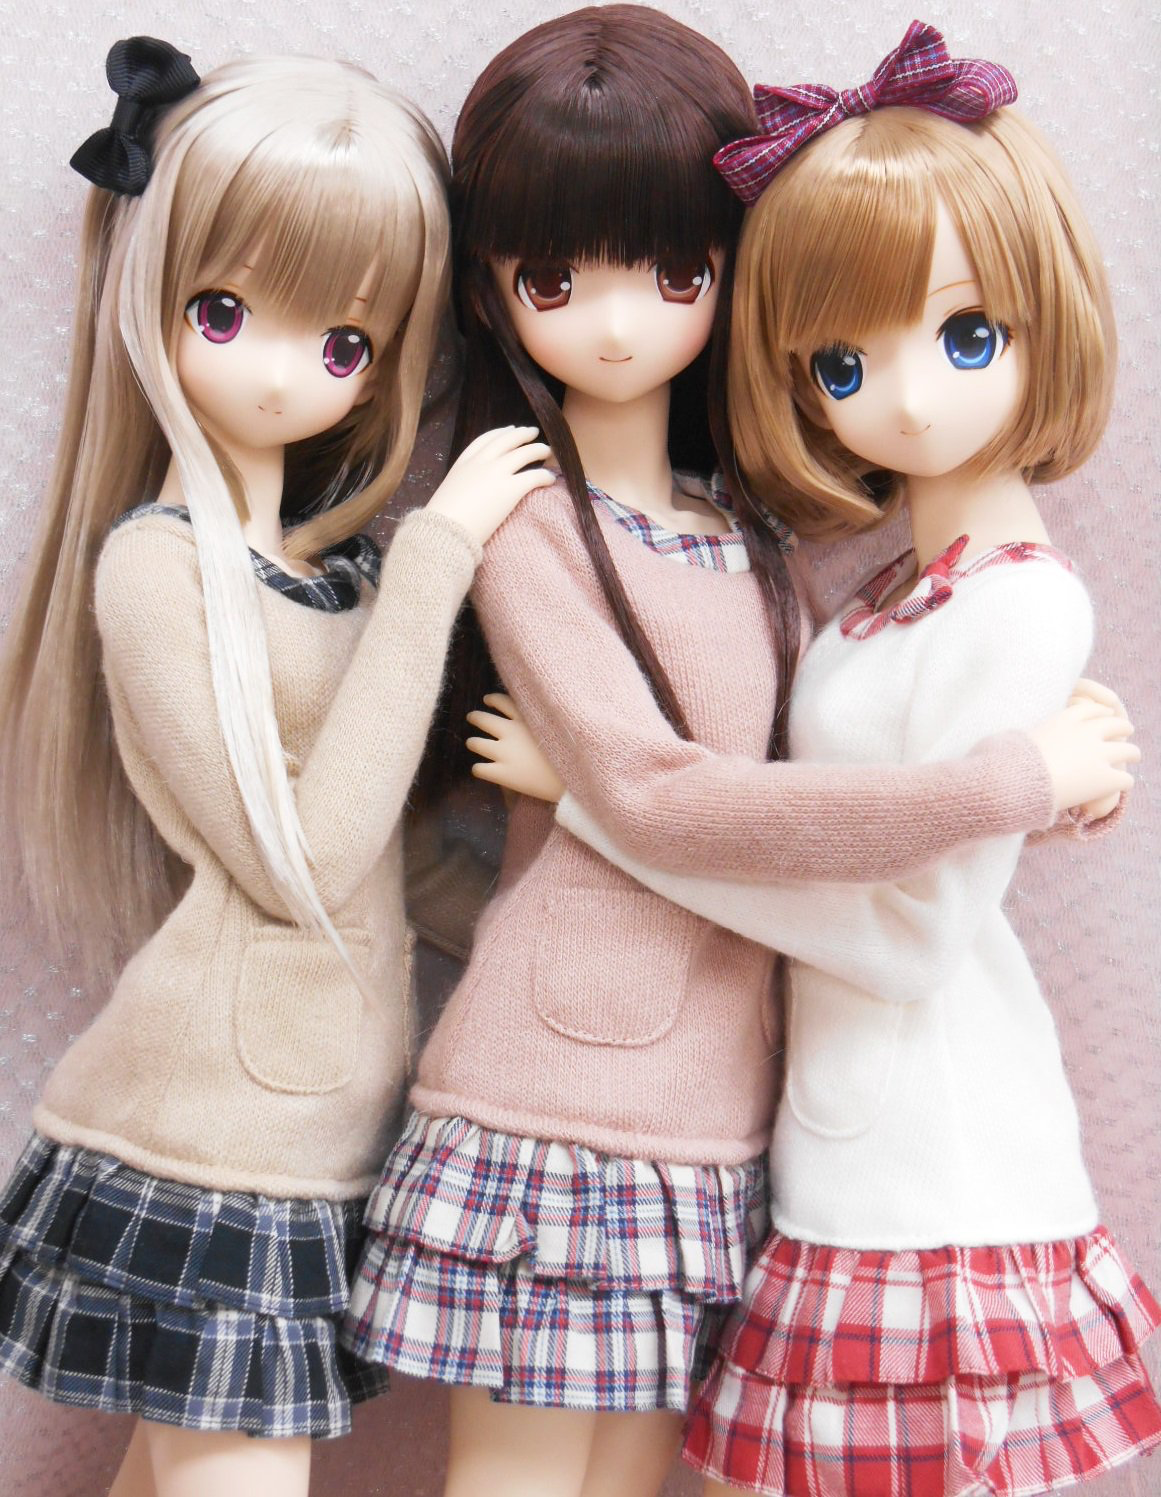 Kawaii anime doll bjd smart doll ball jointed dollfie